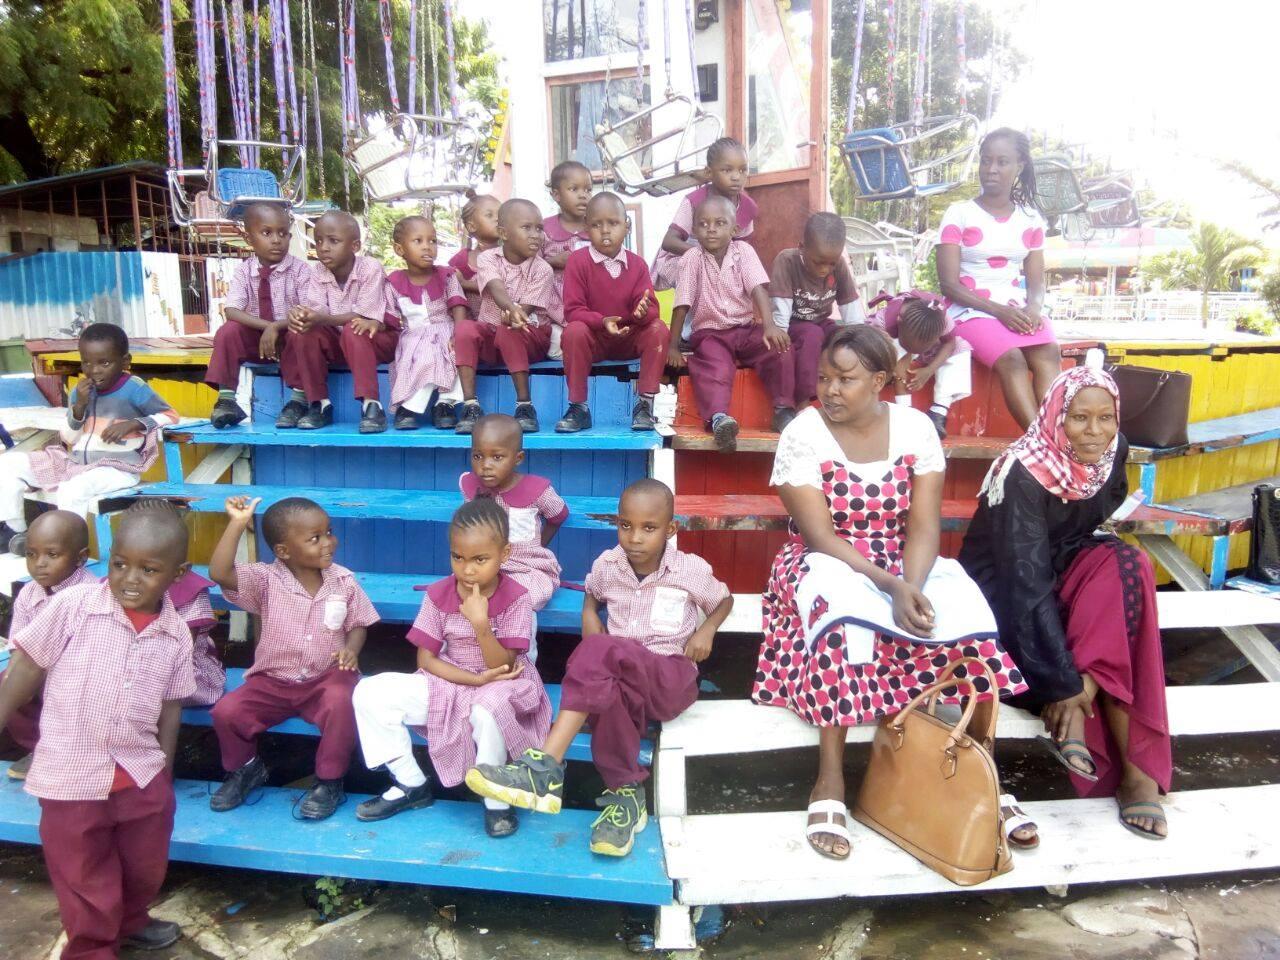 Unser erster Ausflug zum Luna Park nach Nyali